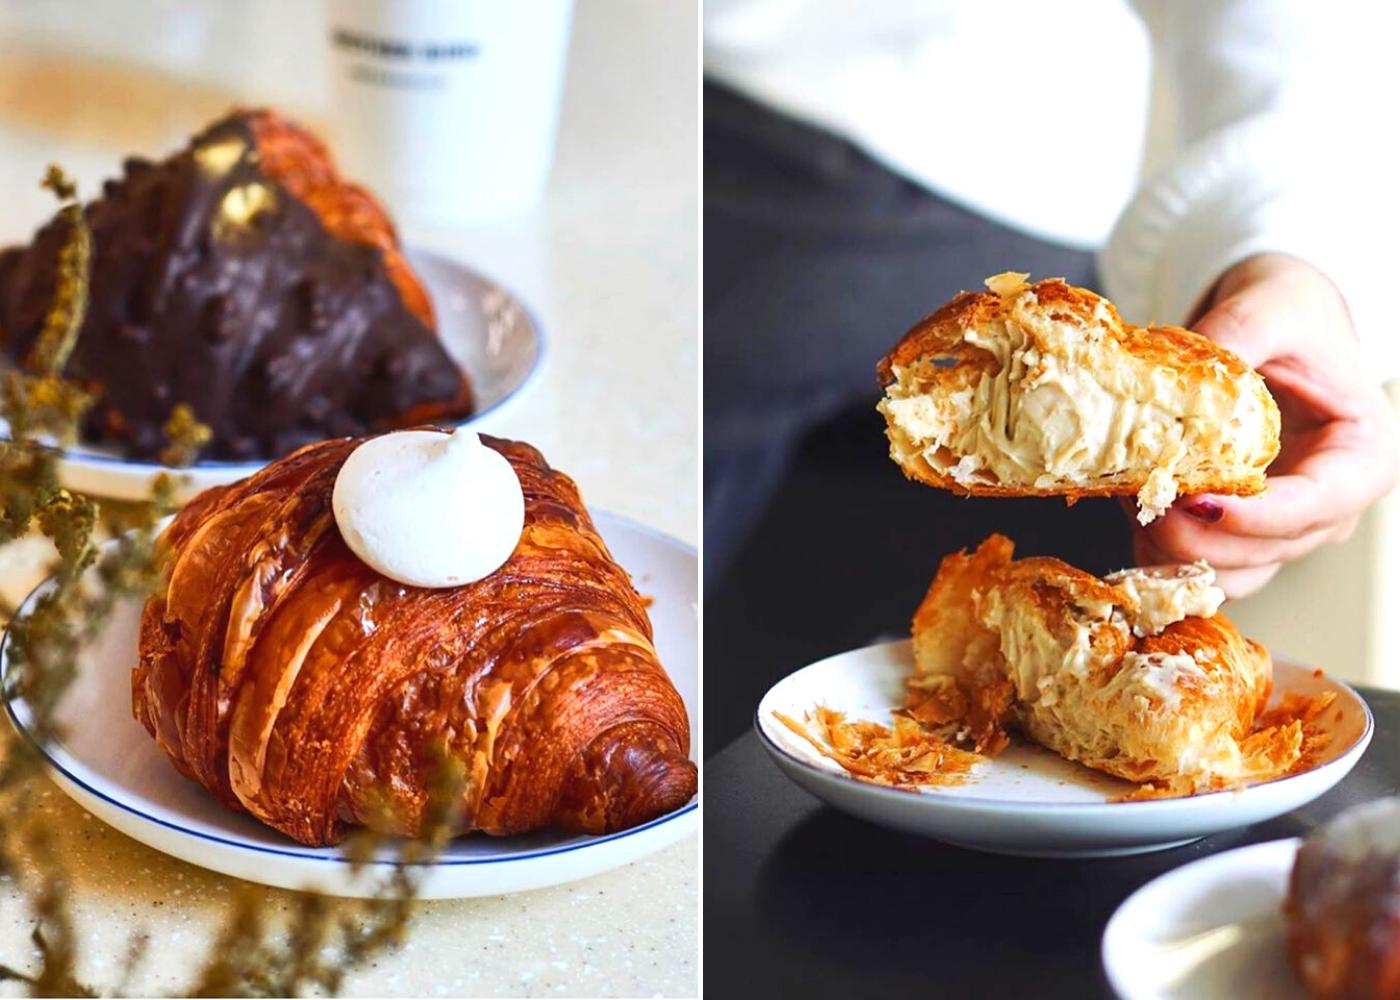 Best croissants in Singapore: Brotherbird